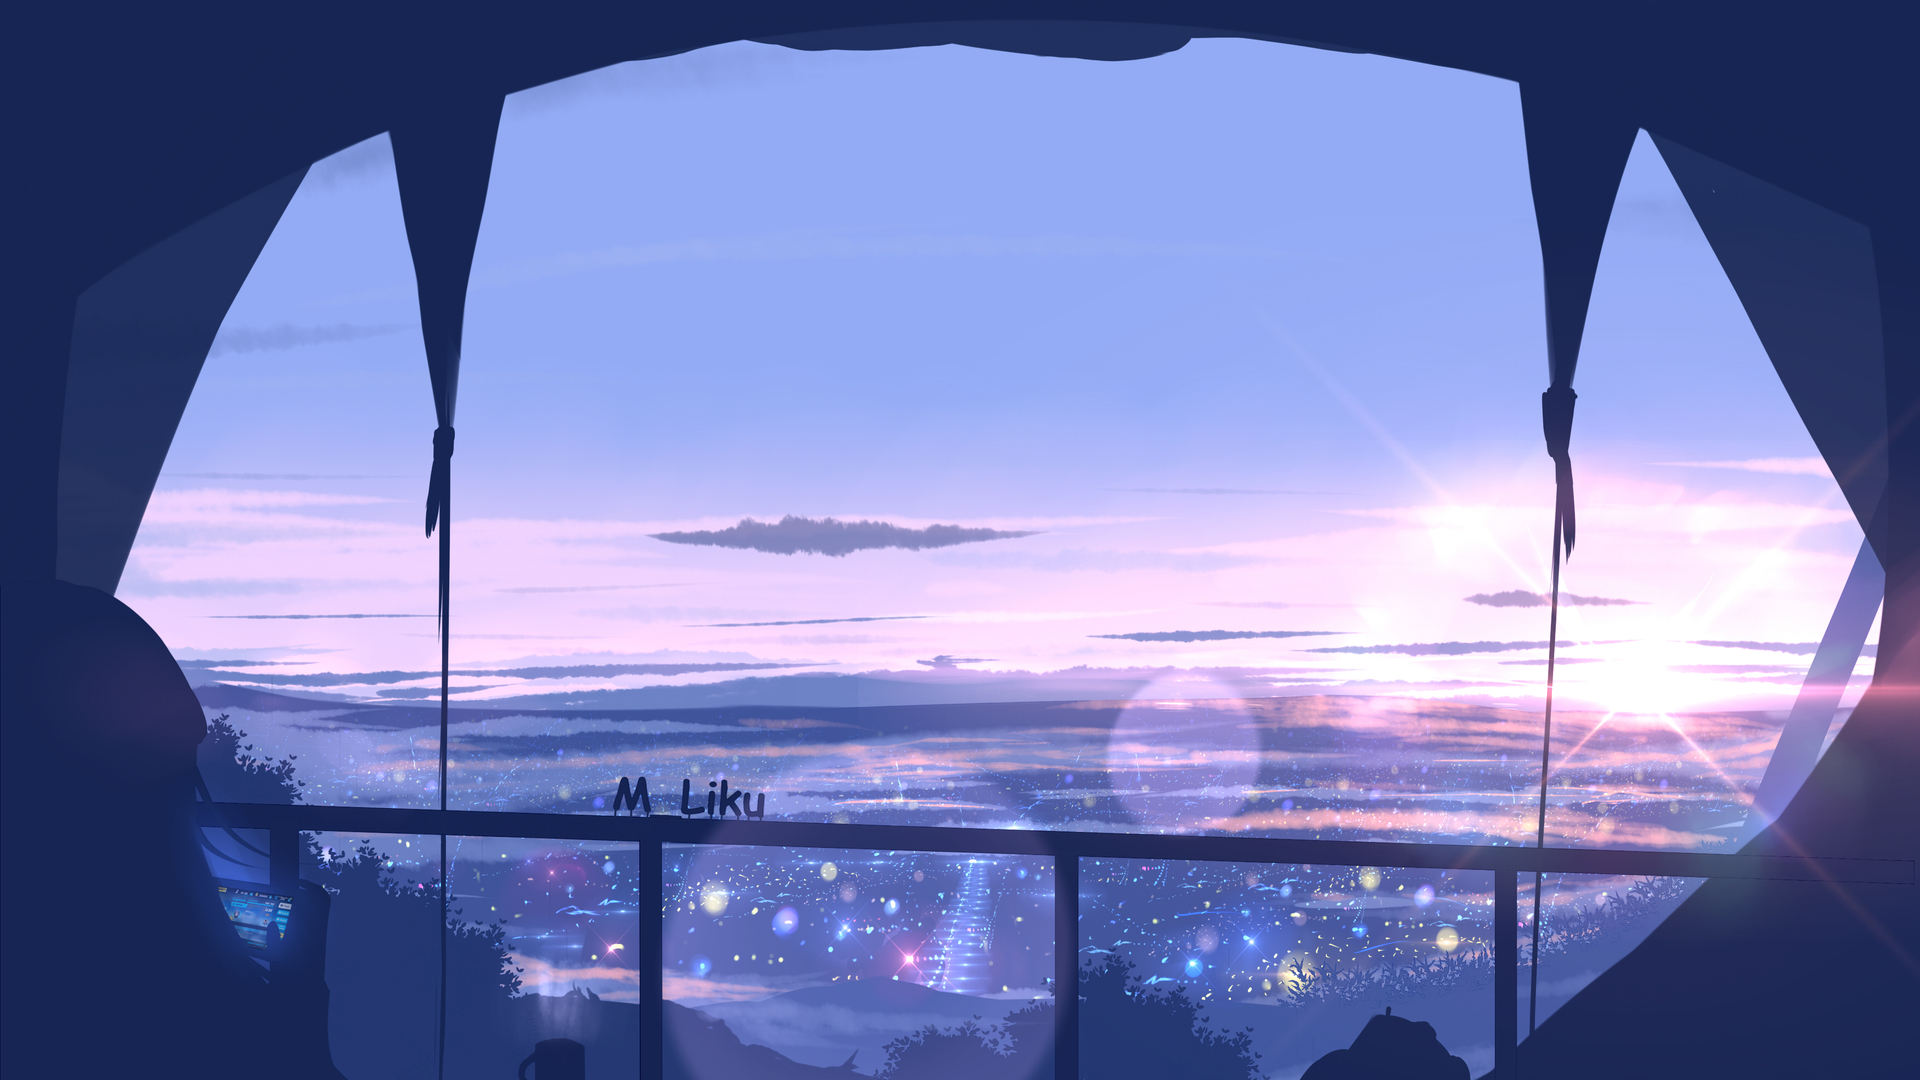 1920x1080 Scenery View From Window Anime 4k Laptop Full Hd